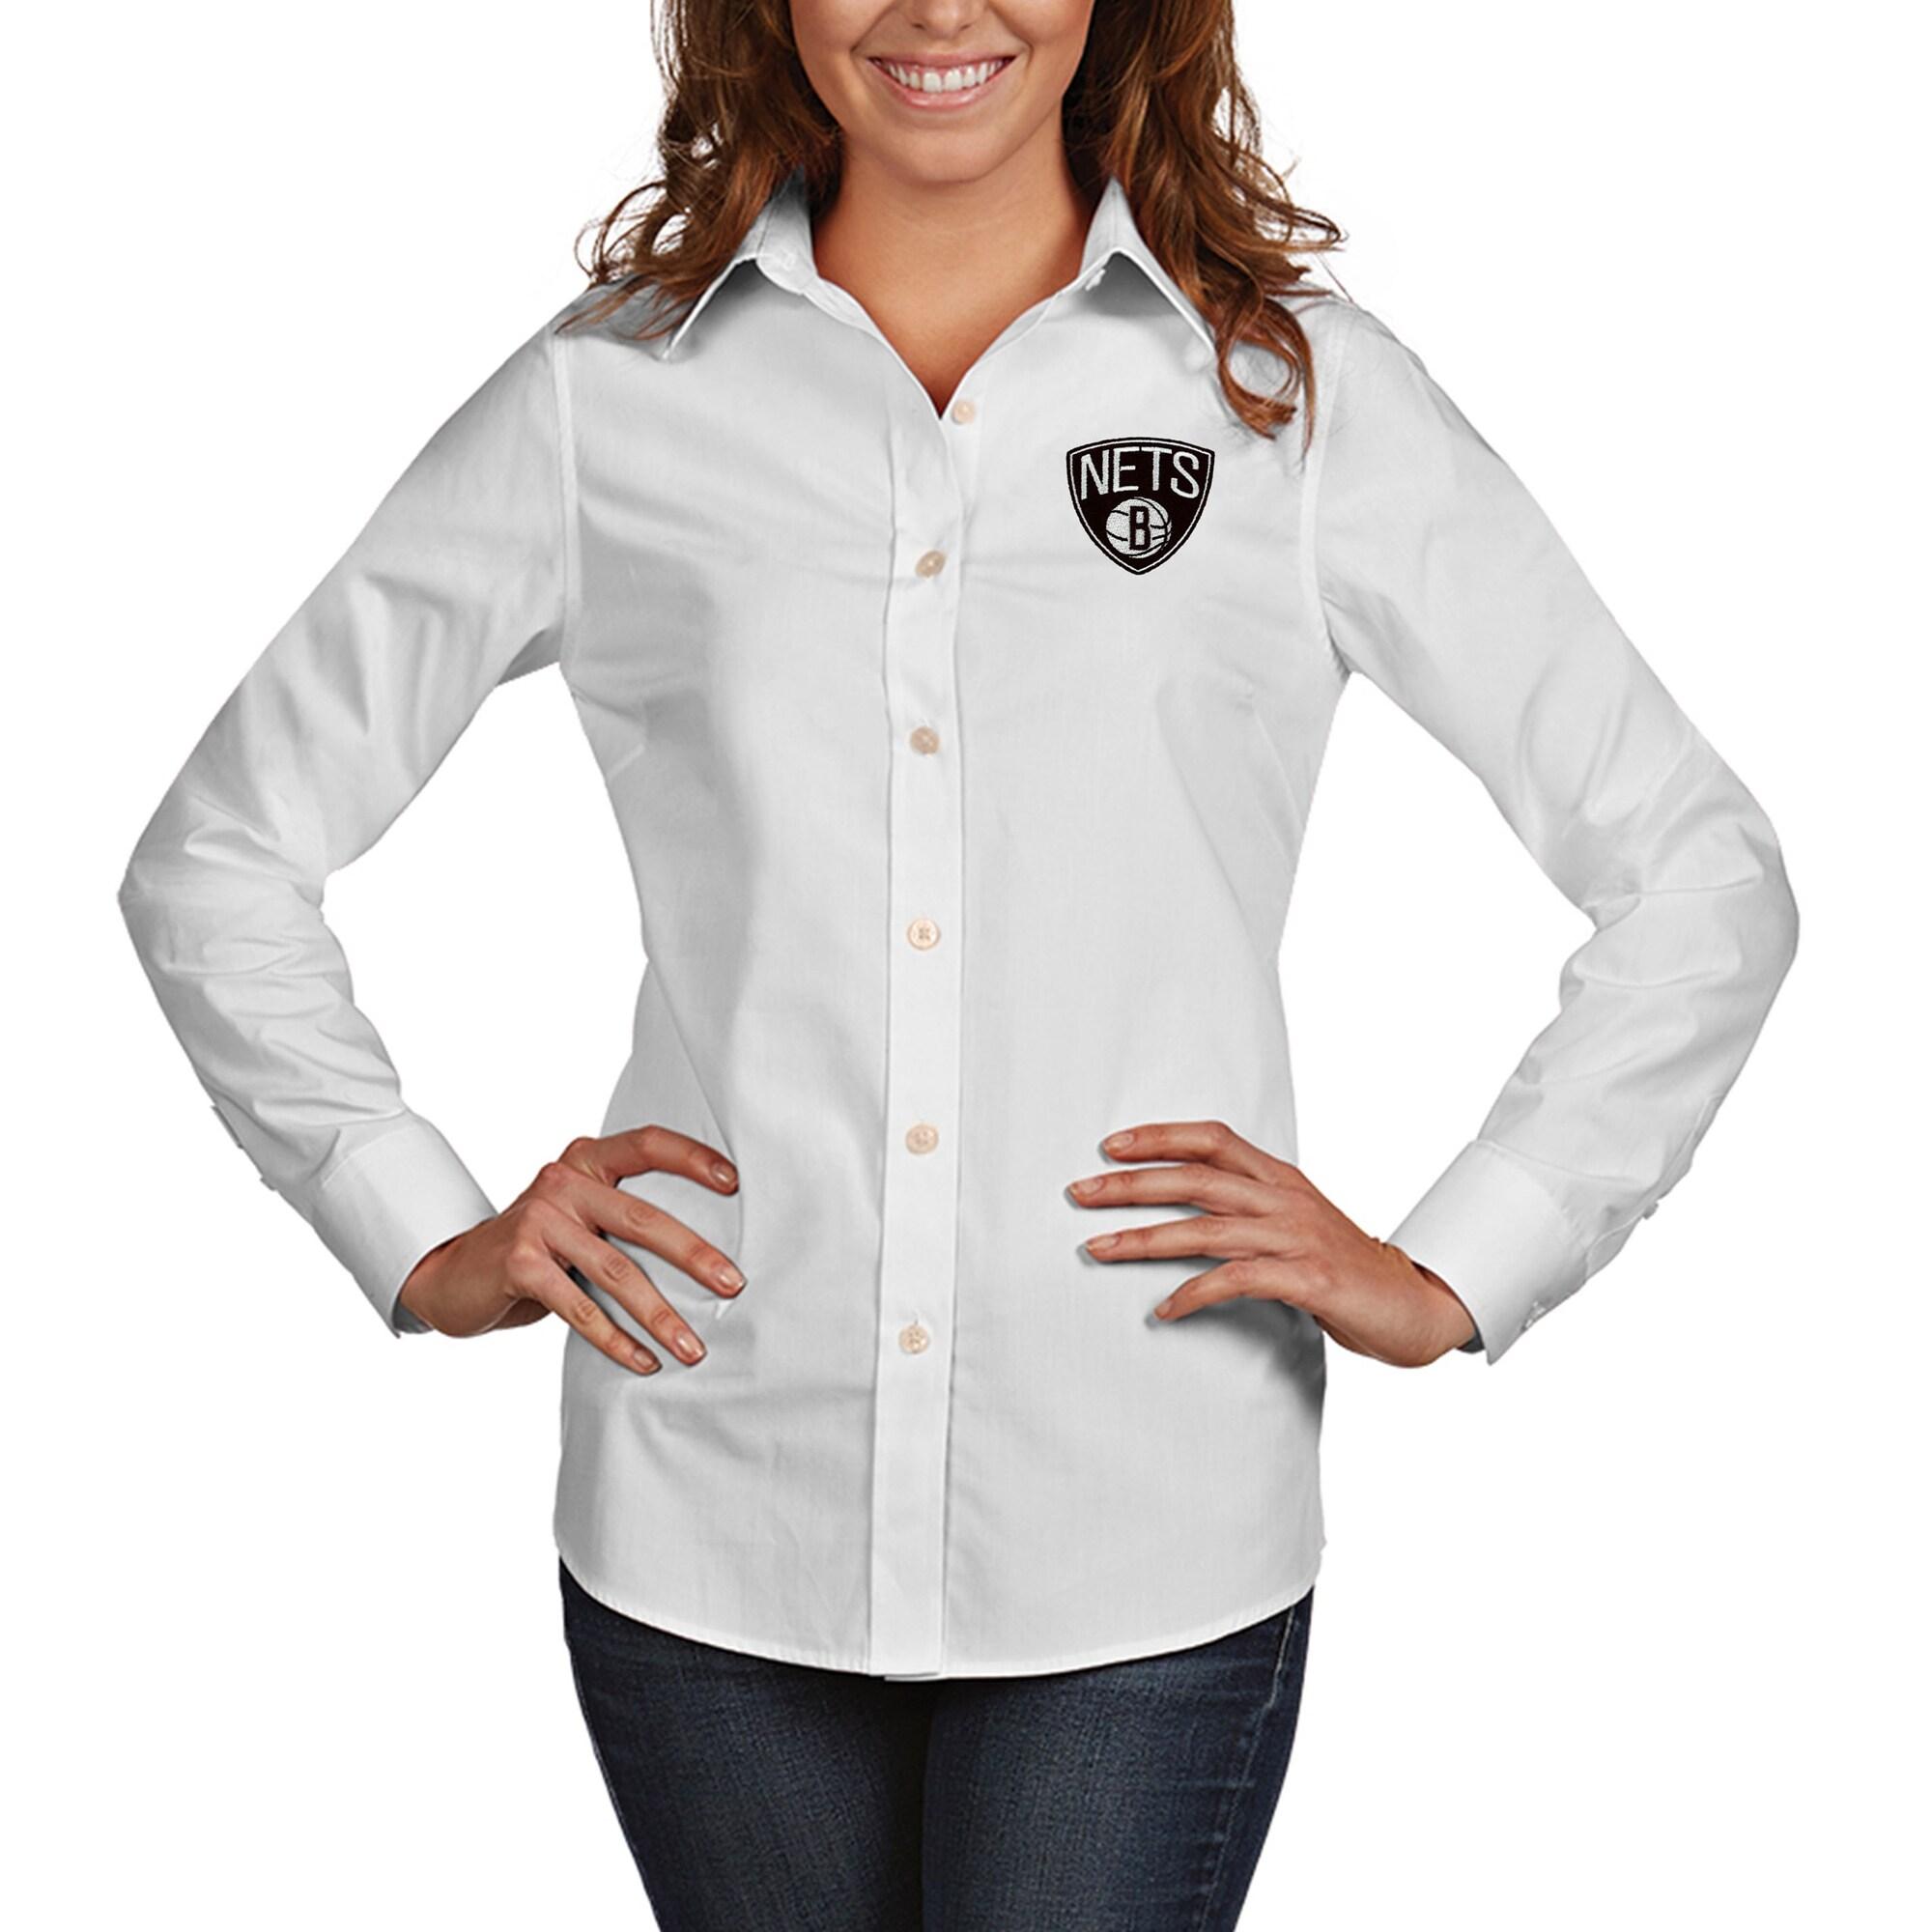 Brooklyn Nets Antigua Women's Dynasty Woven Button-Up Long Sleeve Shirt - White